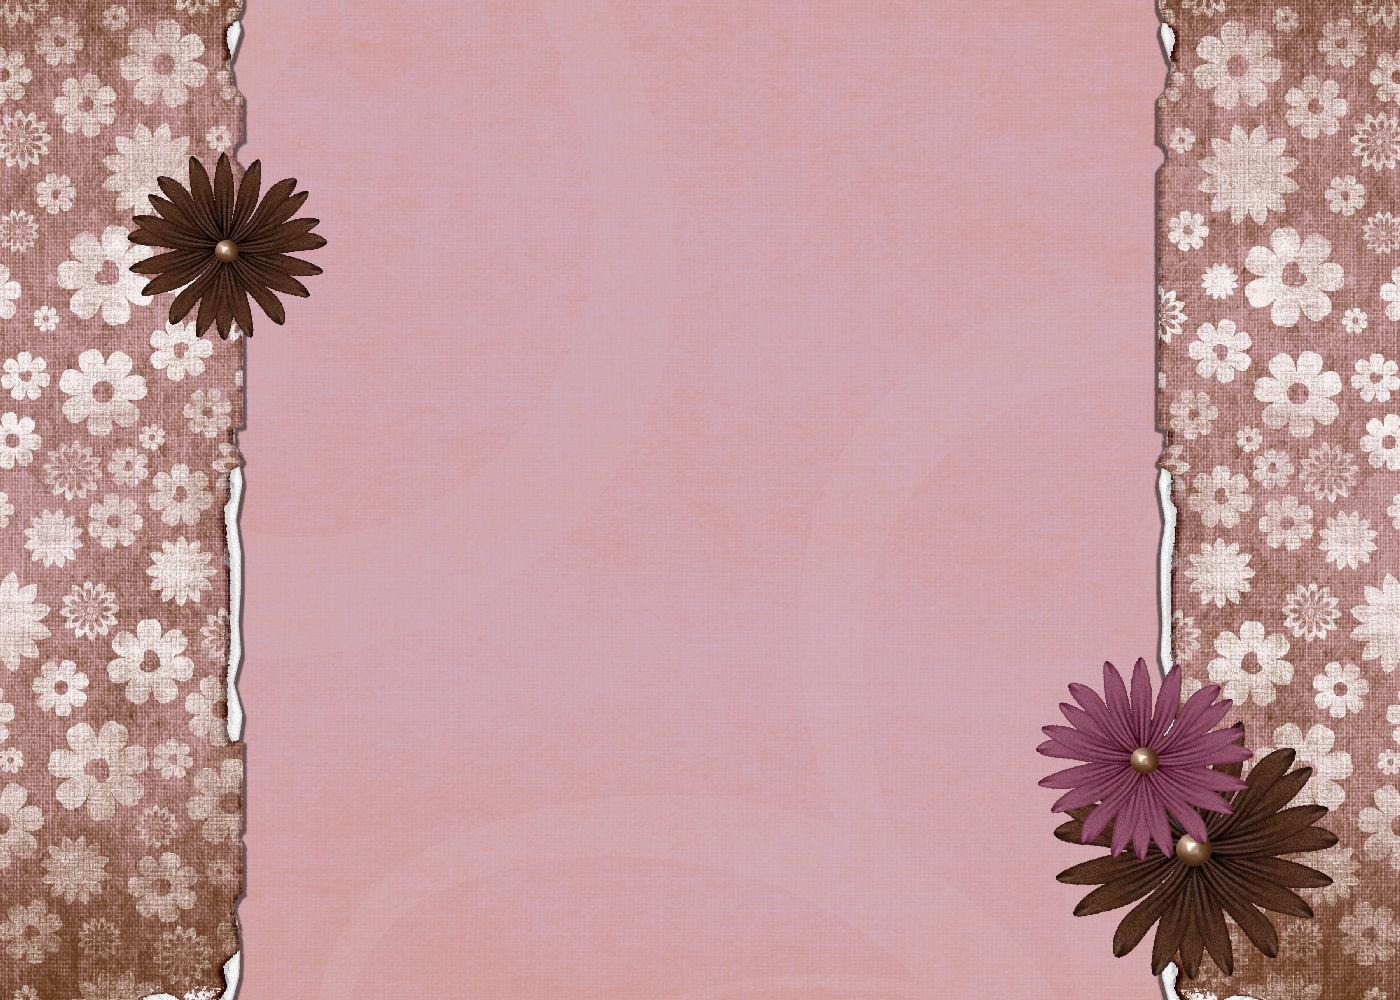 wallpaper Bg2 Wallpaper 1400x1000